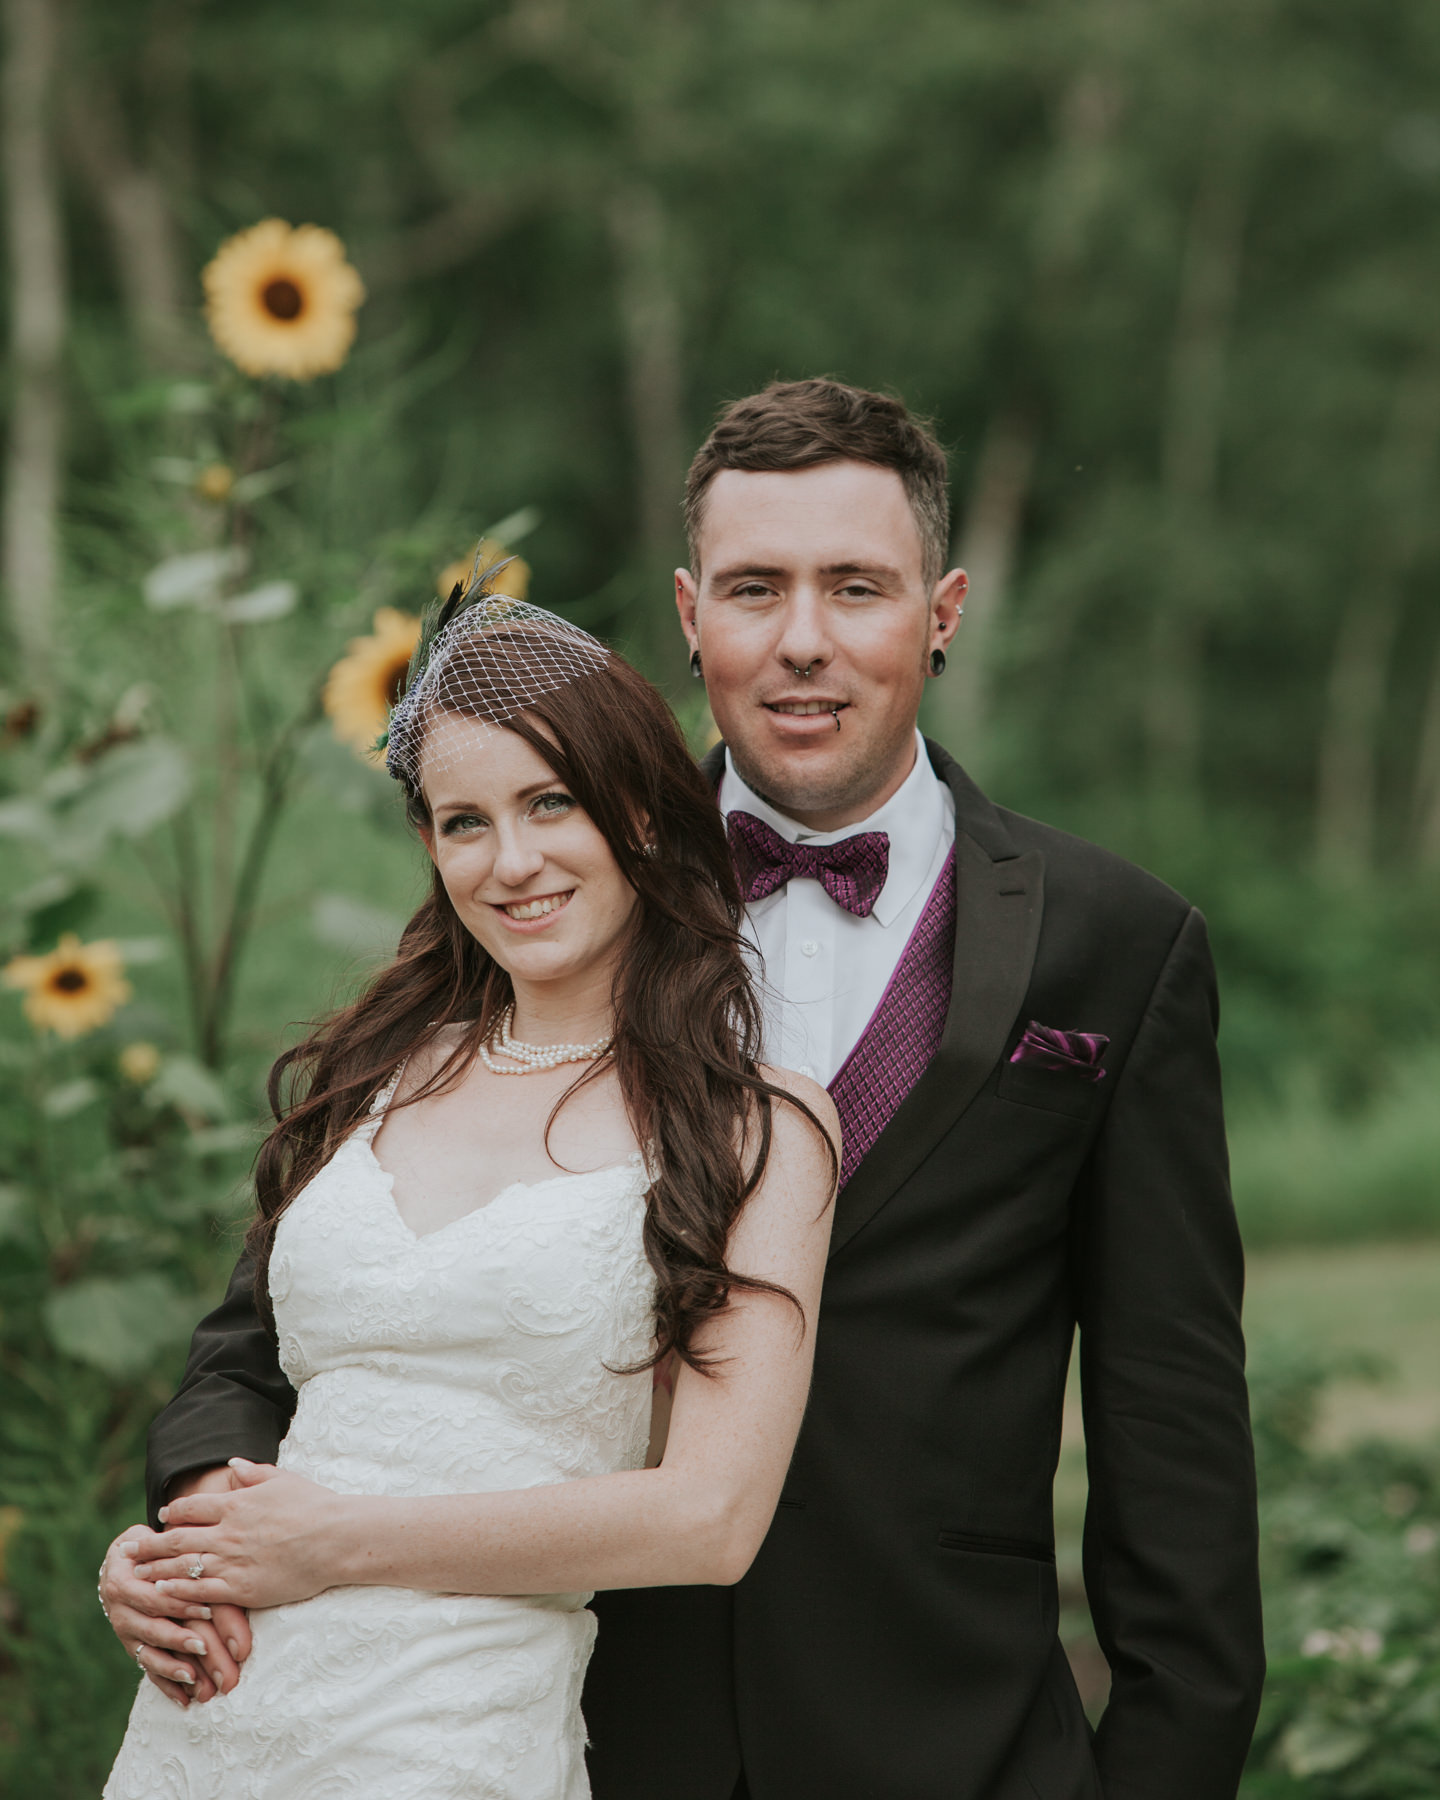 Vancouver Wedding Photographer Pam (52).jpg